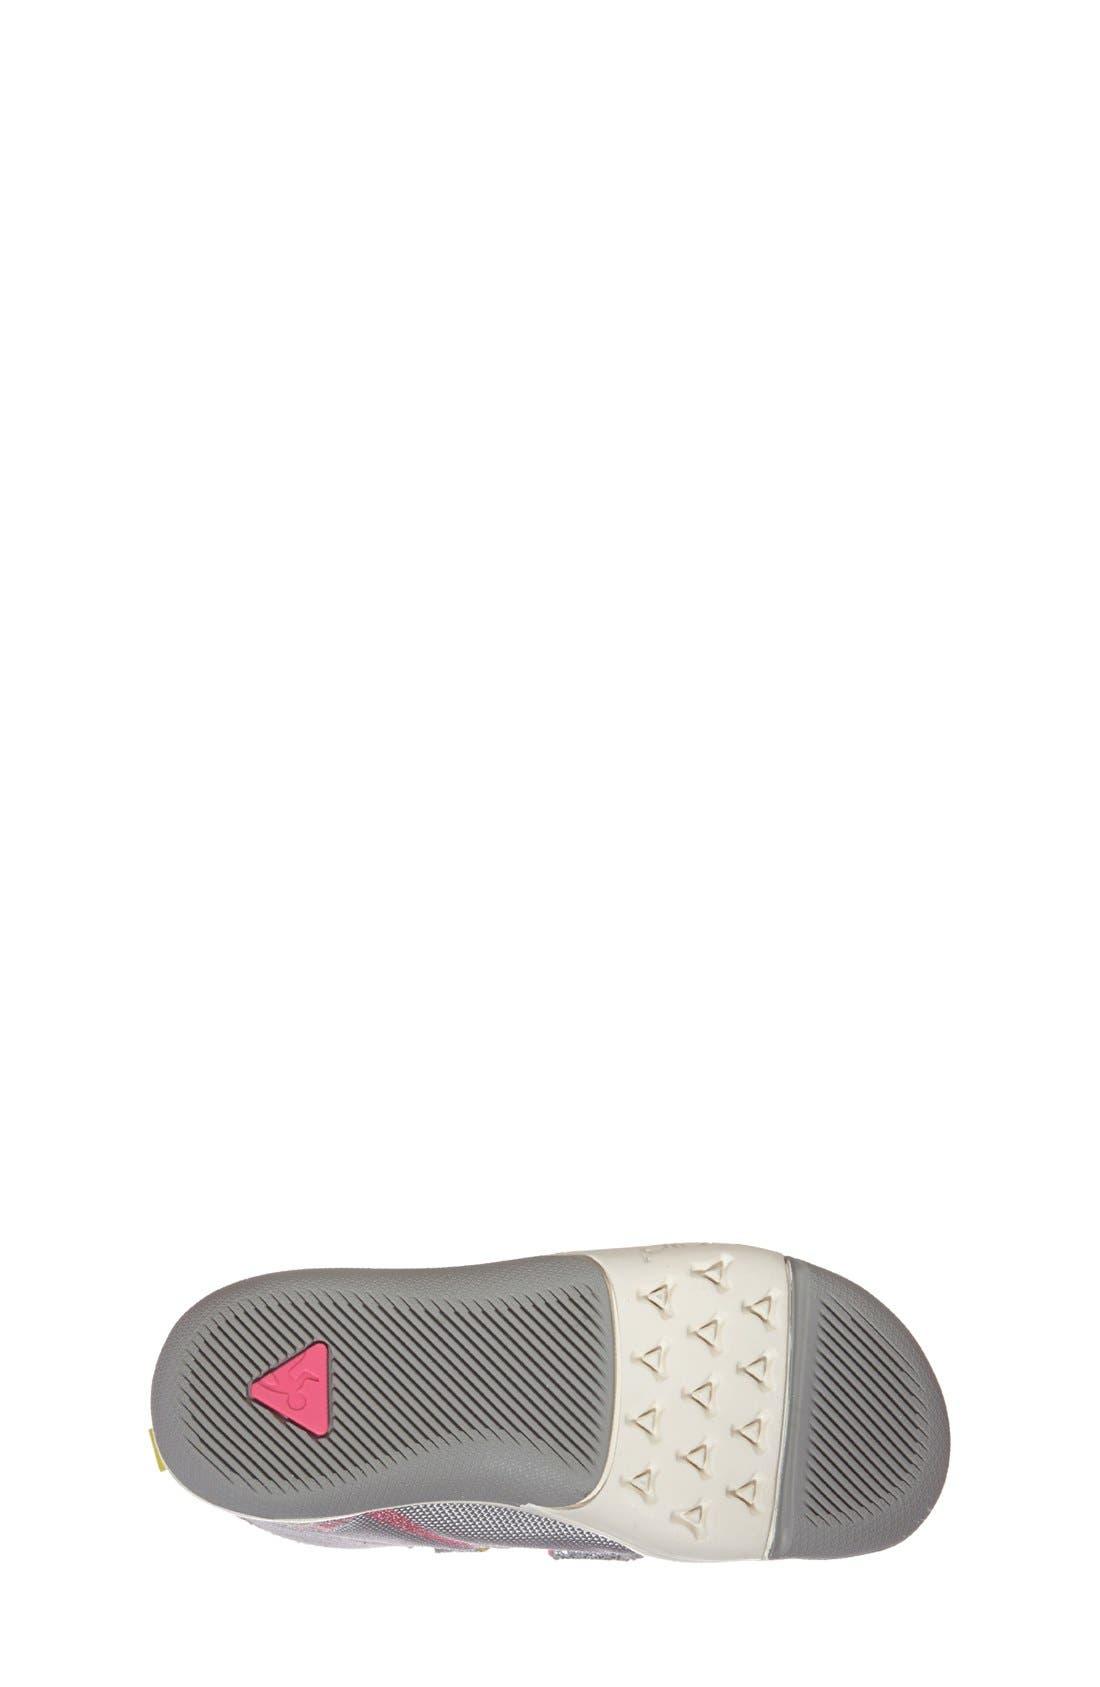 'Max' Customizable High Top Sneaker,                             Alternate thumbnail 2, color,                             040